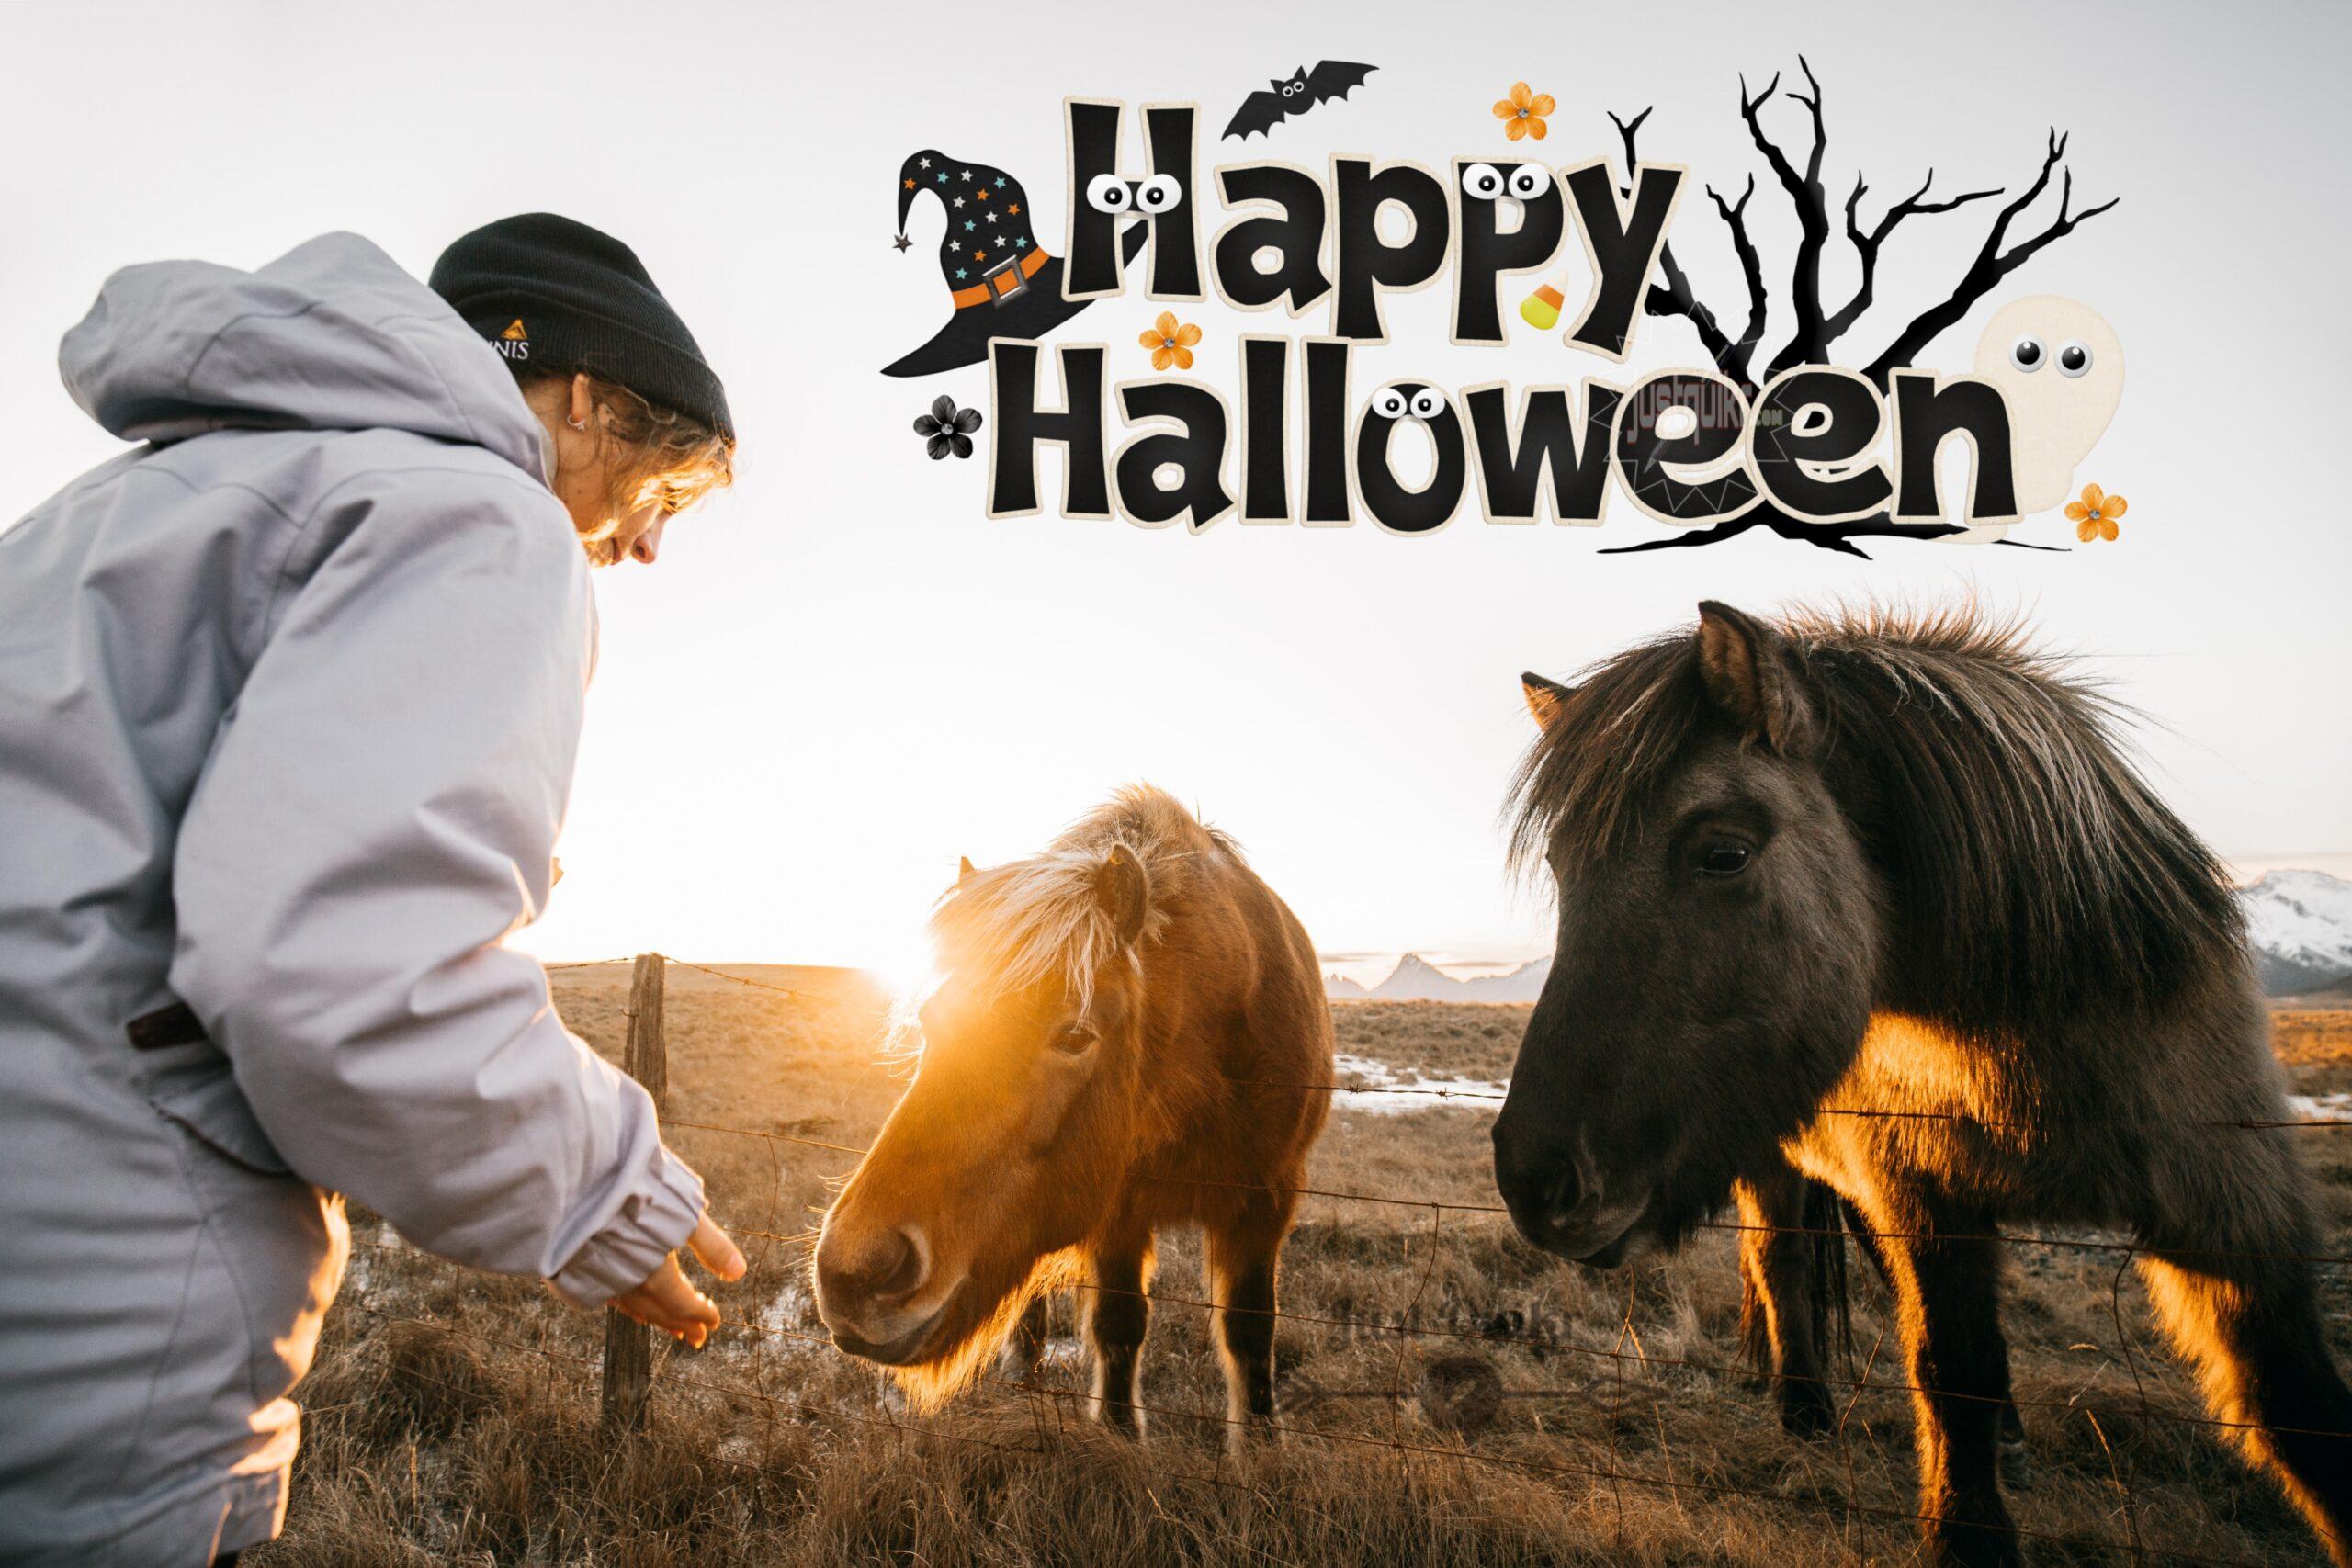 Halloween Day Fancy Dress Ideas for Horse